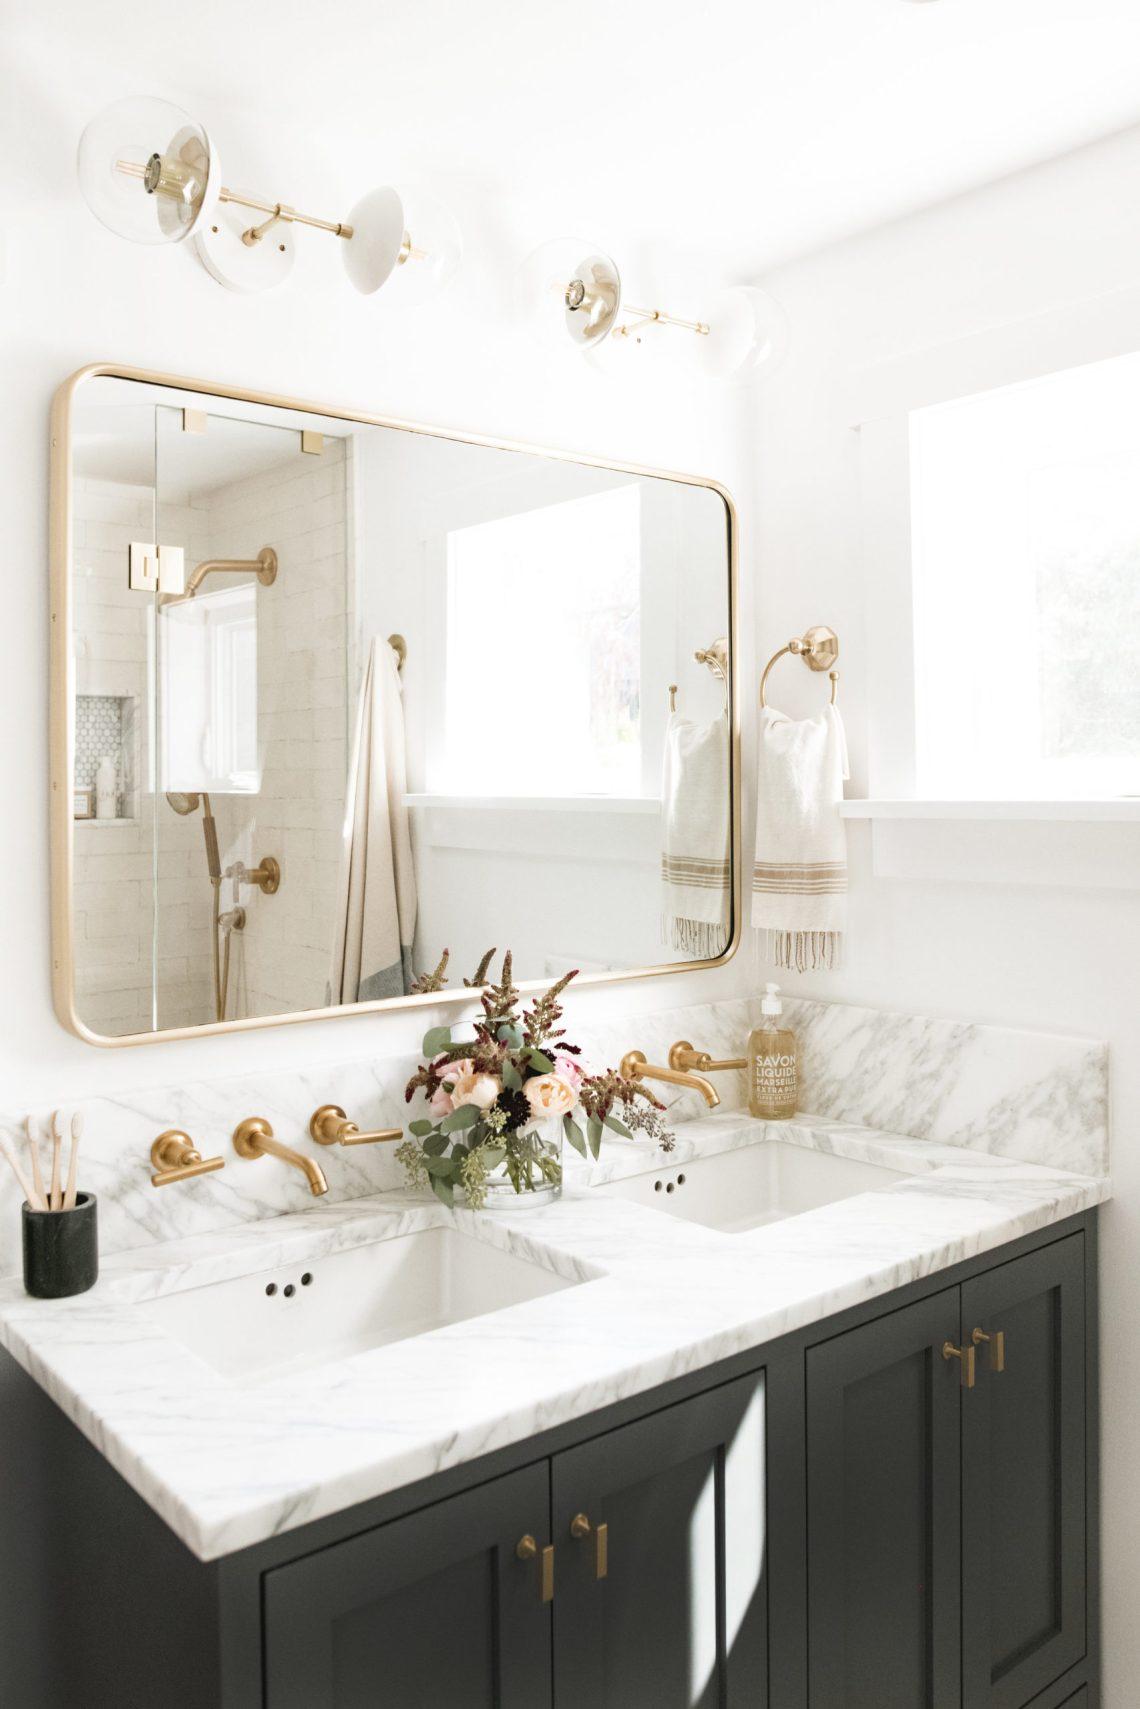 The Best Bathroom Mirror Ideas for 2020 | Decoholic